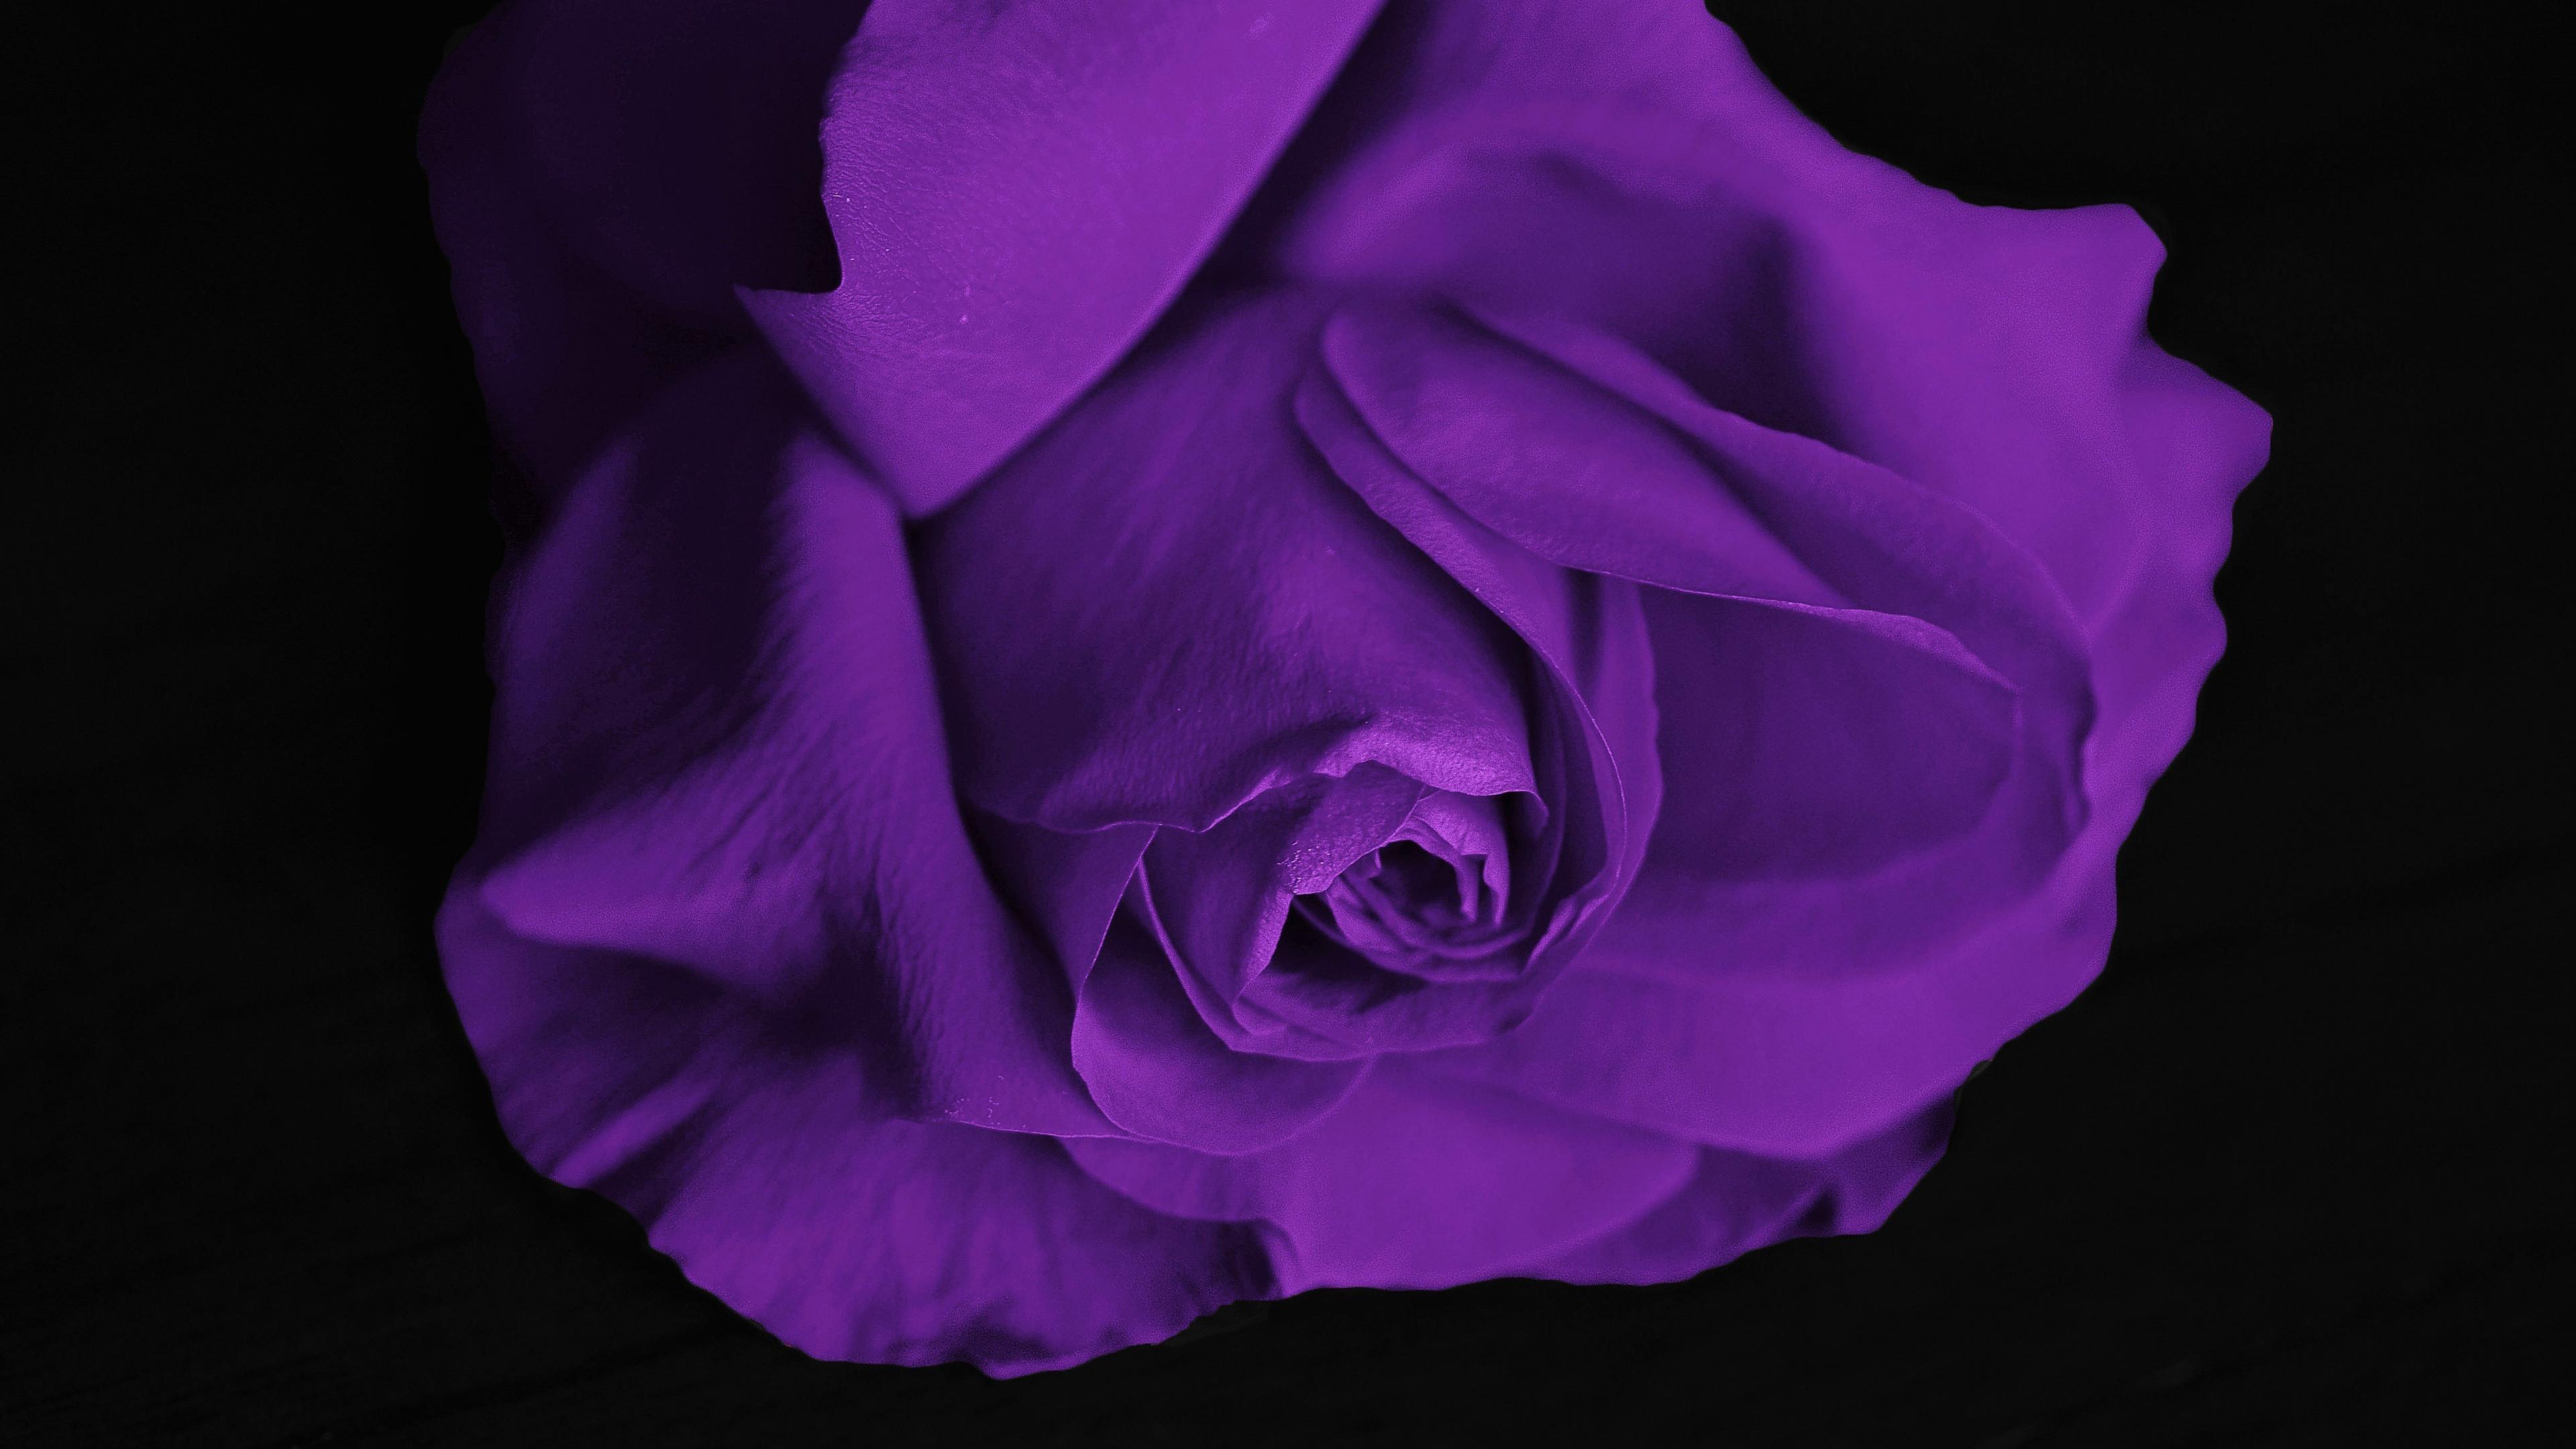 Res: 3840x2160,  wallpaper Purple rose, close up, flower